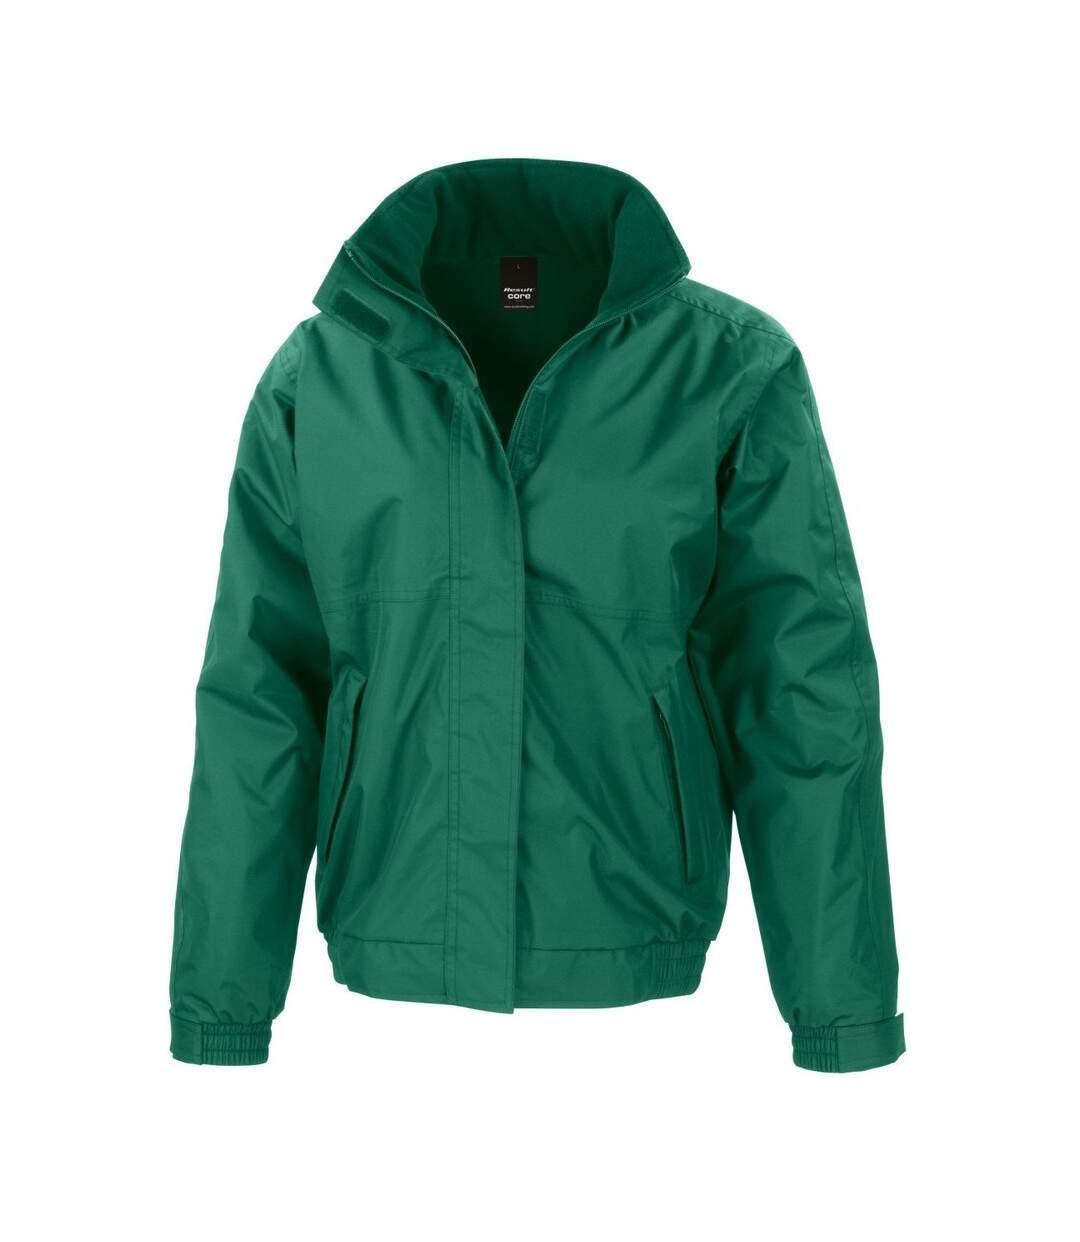 Result Core Mens Channel Jacket (Black) - UTBC914